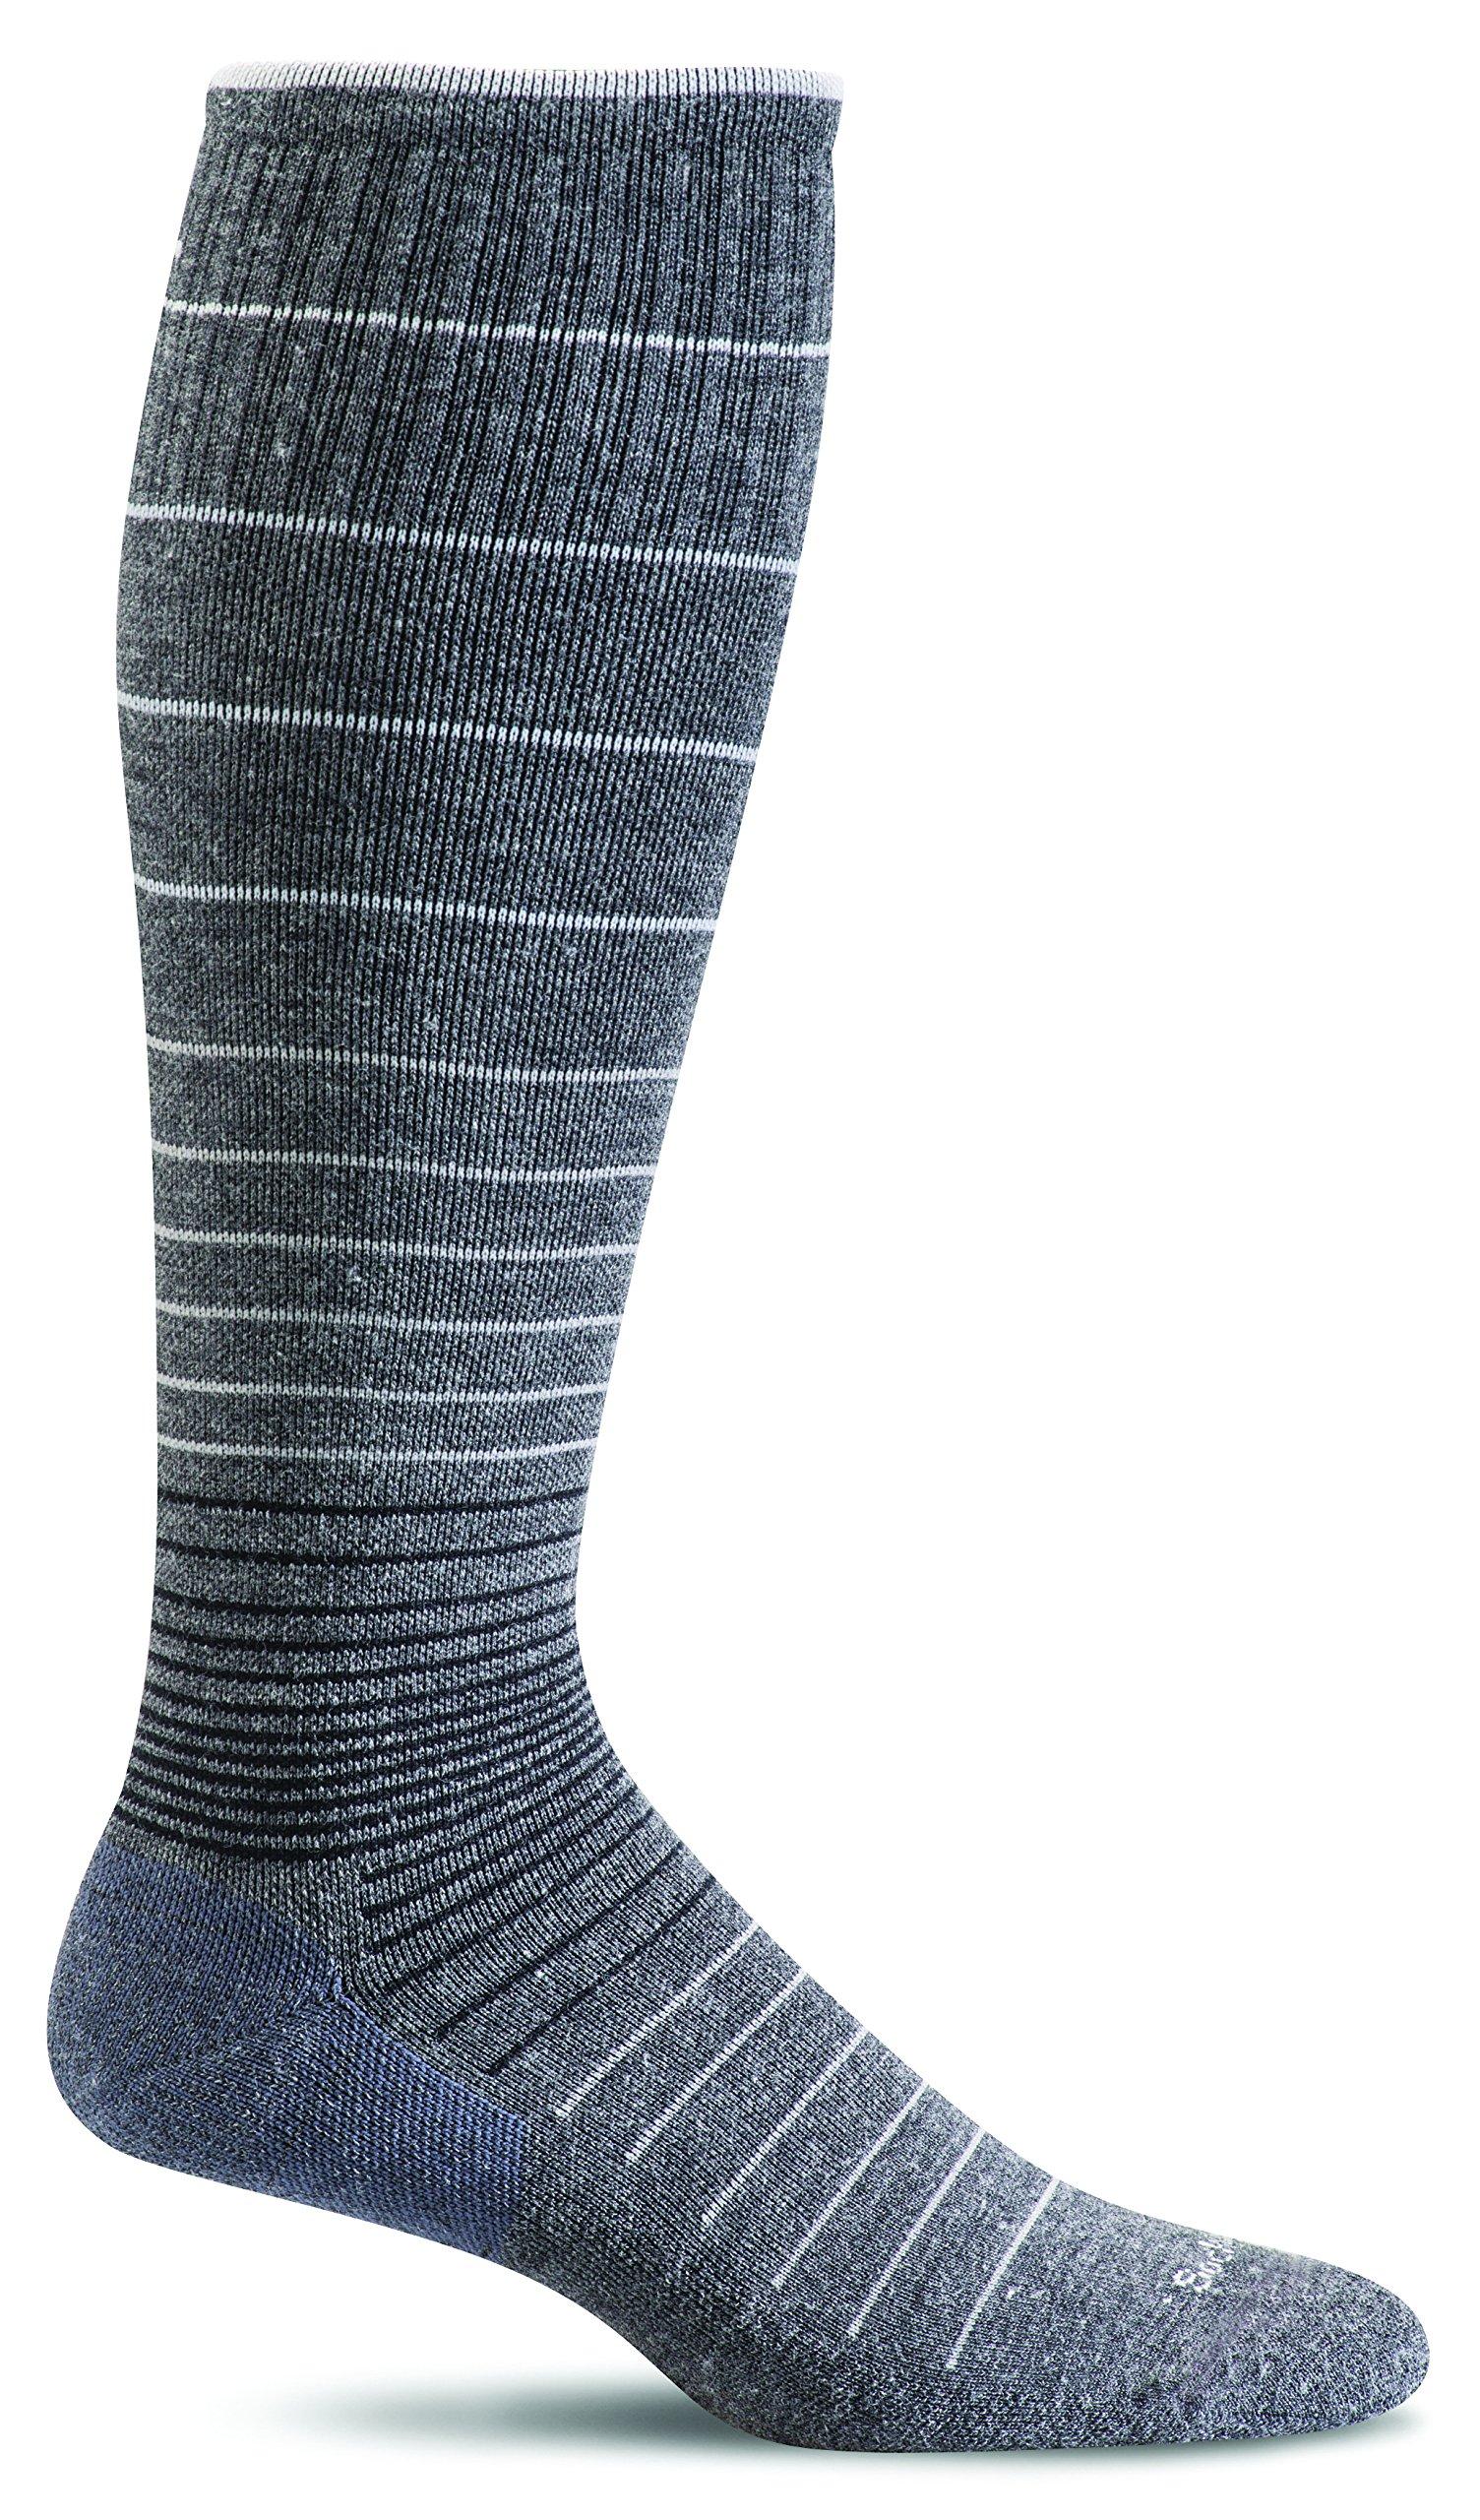 Sockwell Women's Circulator Graduated Compression Socks, Small/Medium (4-7.5) Charcoal